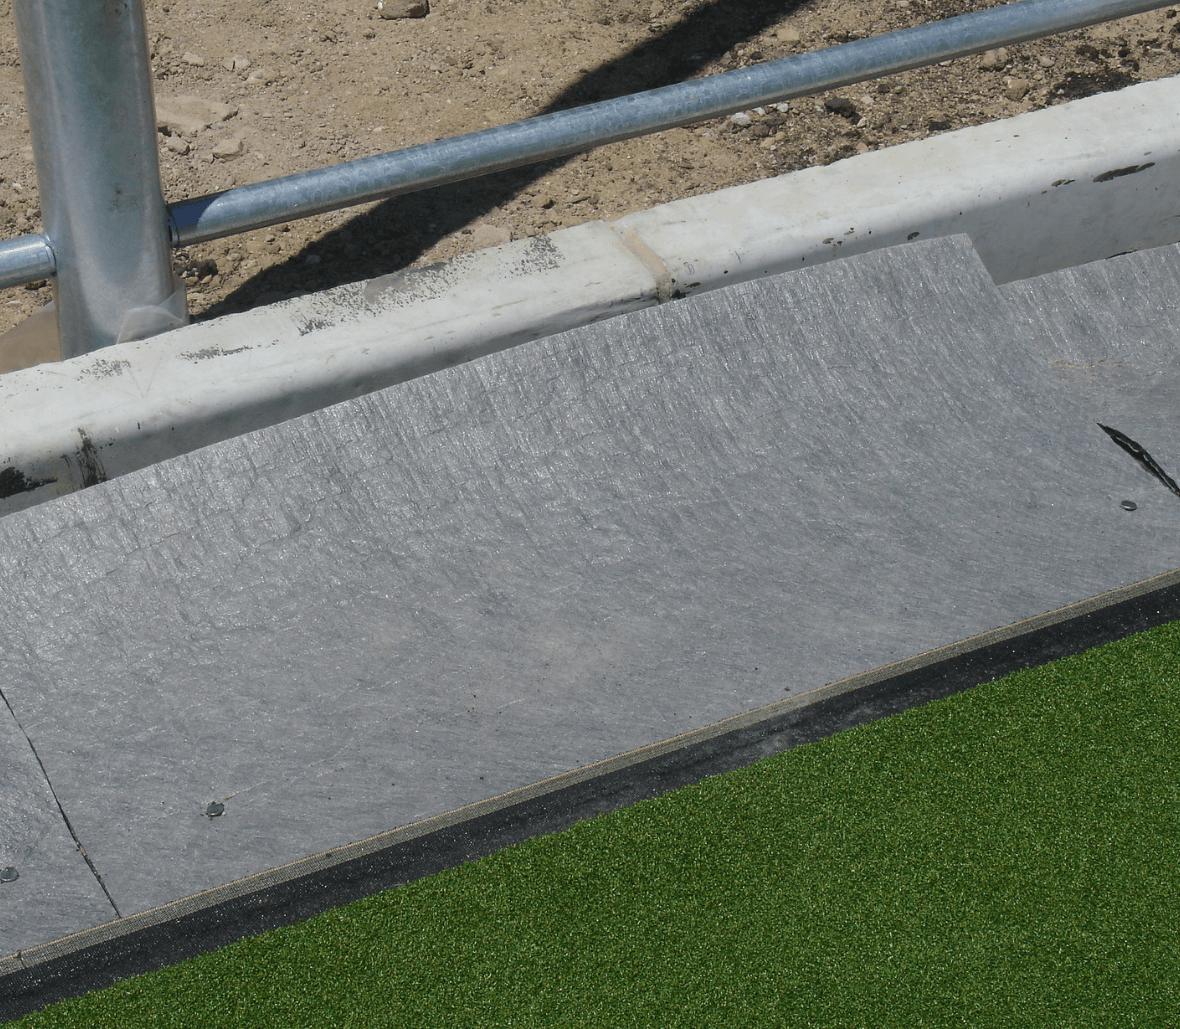 EnkaFlex_shockpad & drainage system for sportsfields_copyrights Low & Bonar_Enka Solutions (9)